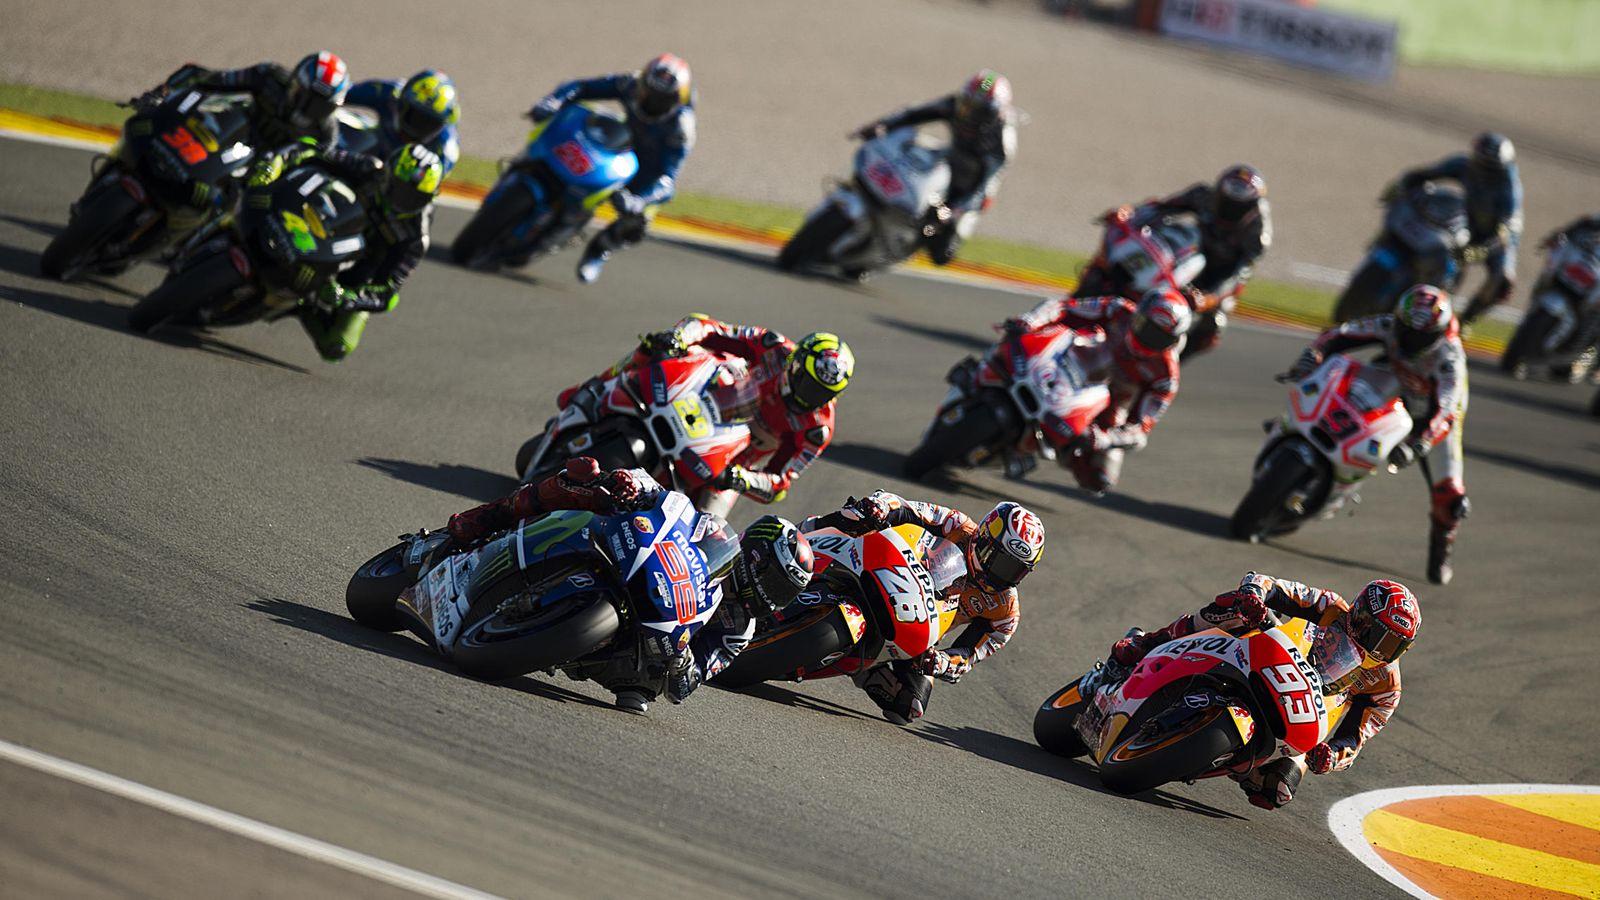 Foto: Dorna Sports es la encargada de organizar el Mundial de MotoGP (Cordon Press).